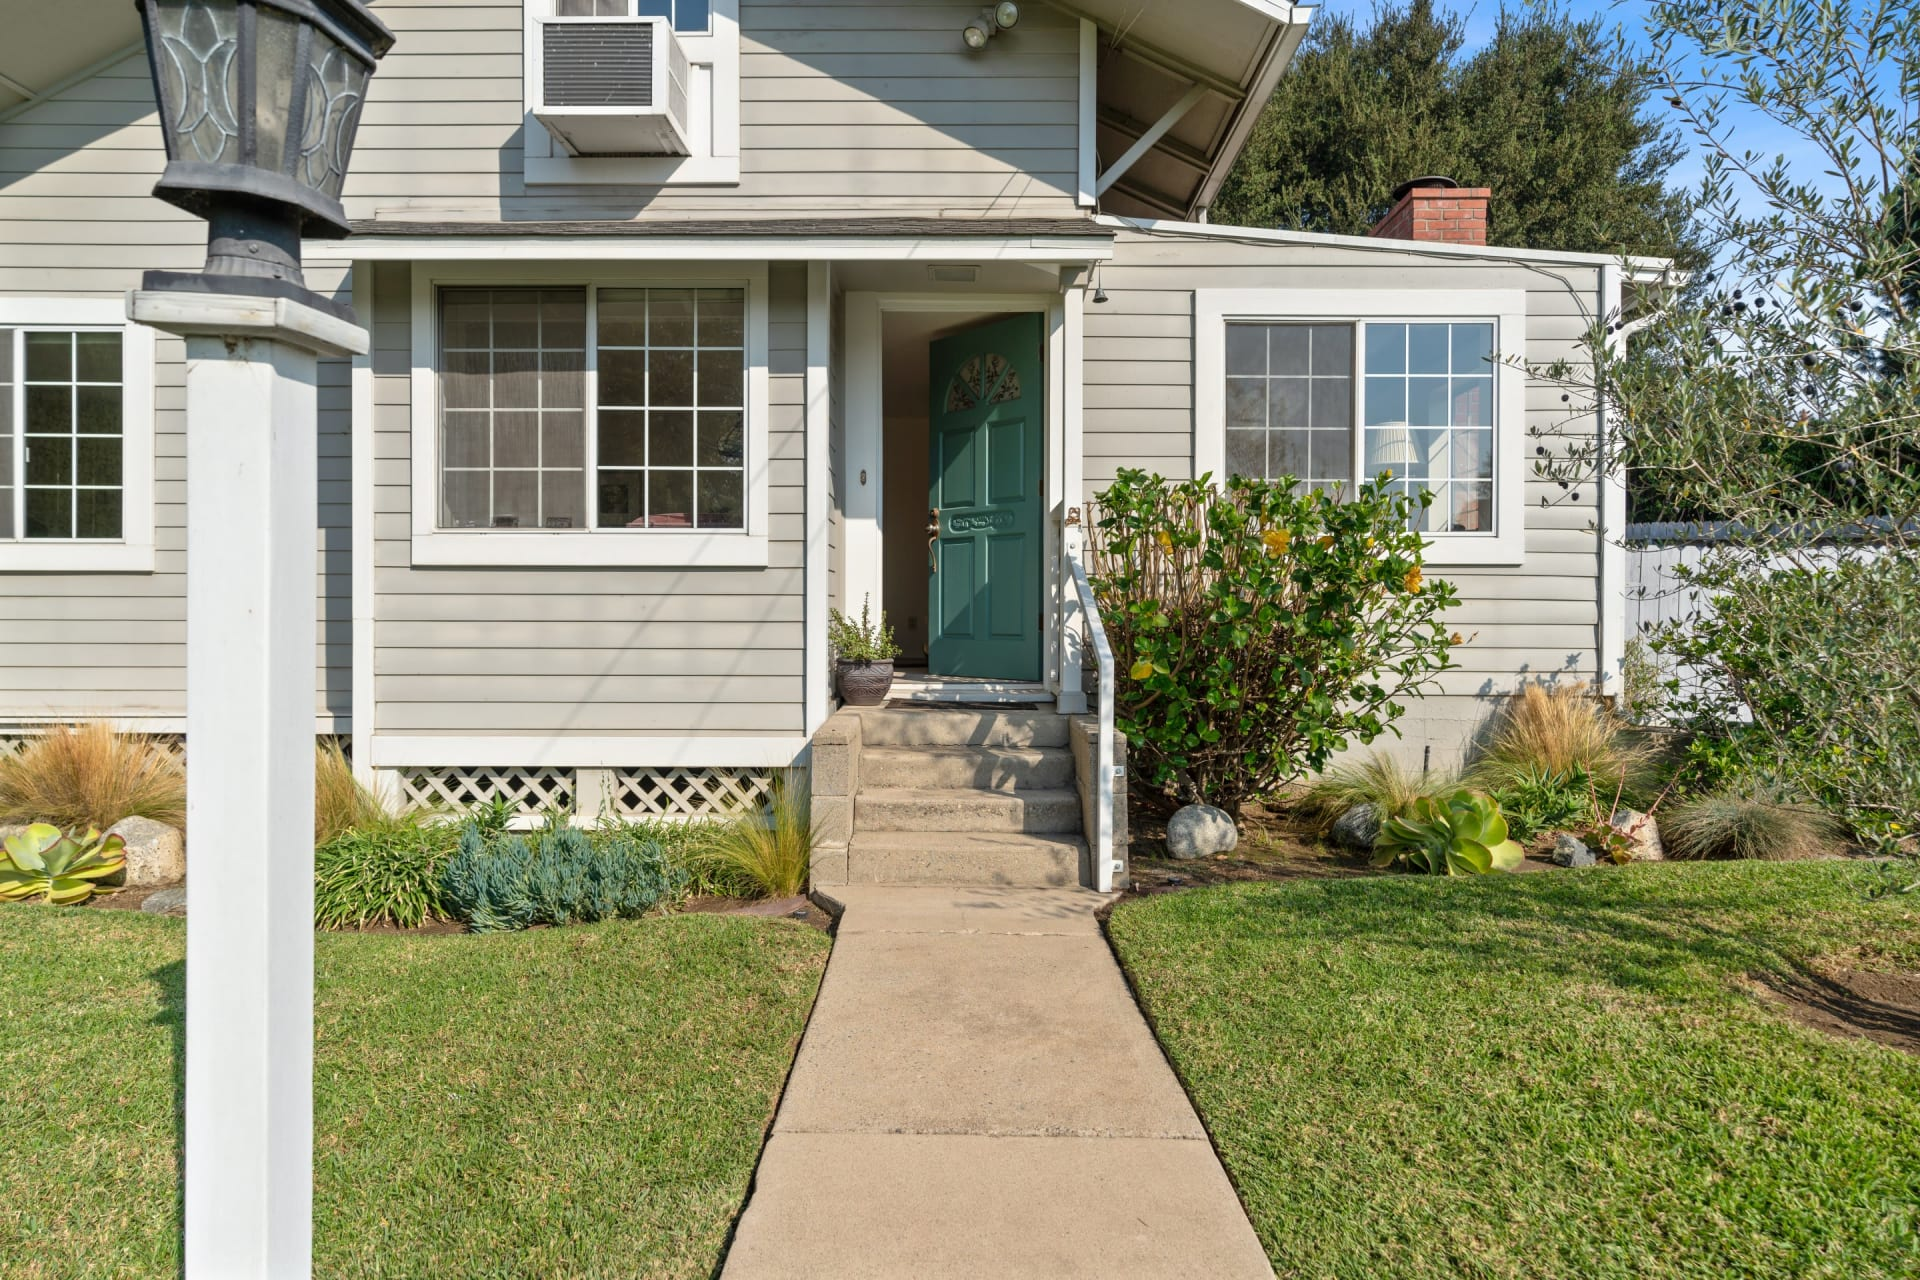 657 Ramona Ave photo